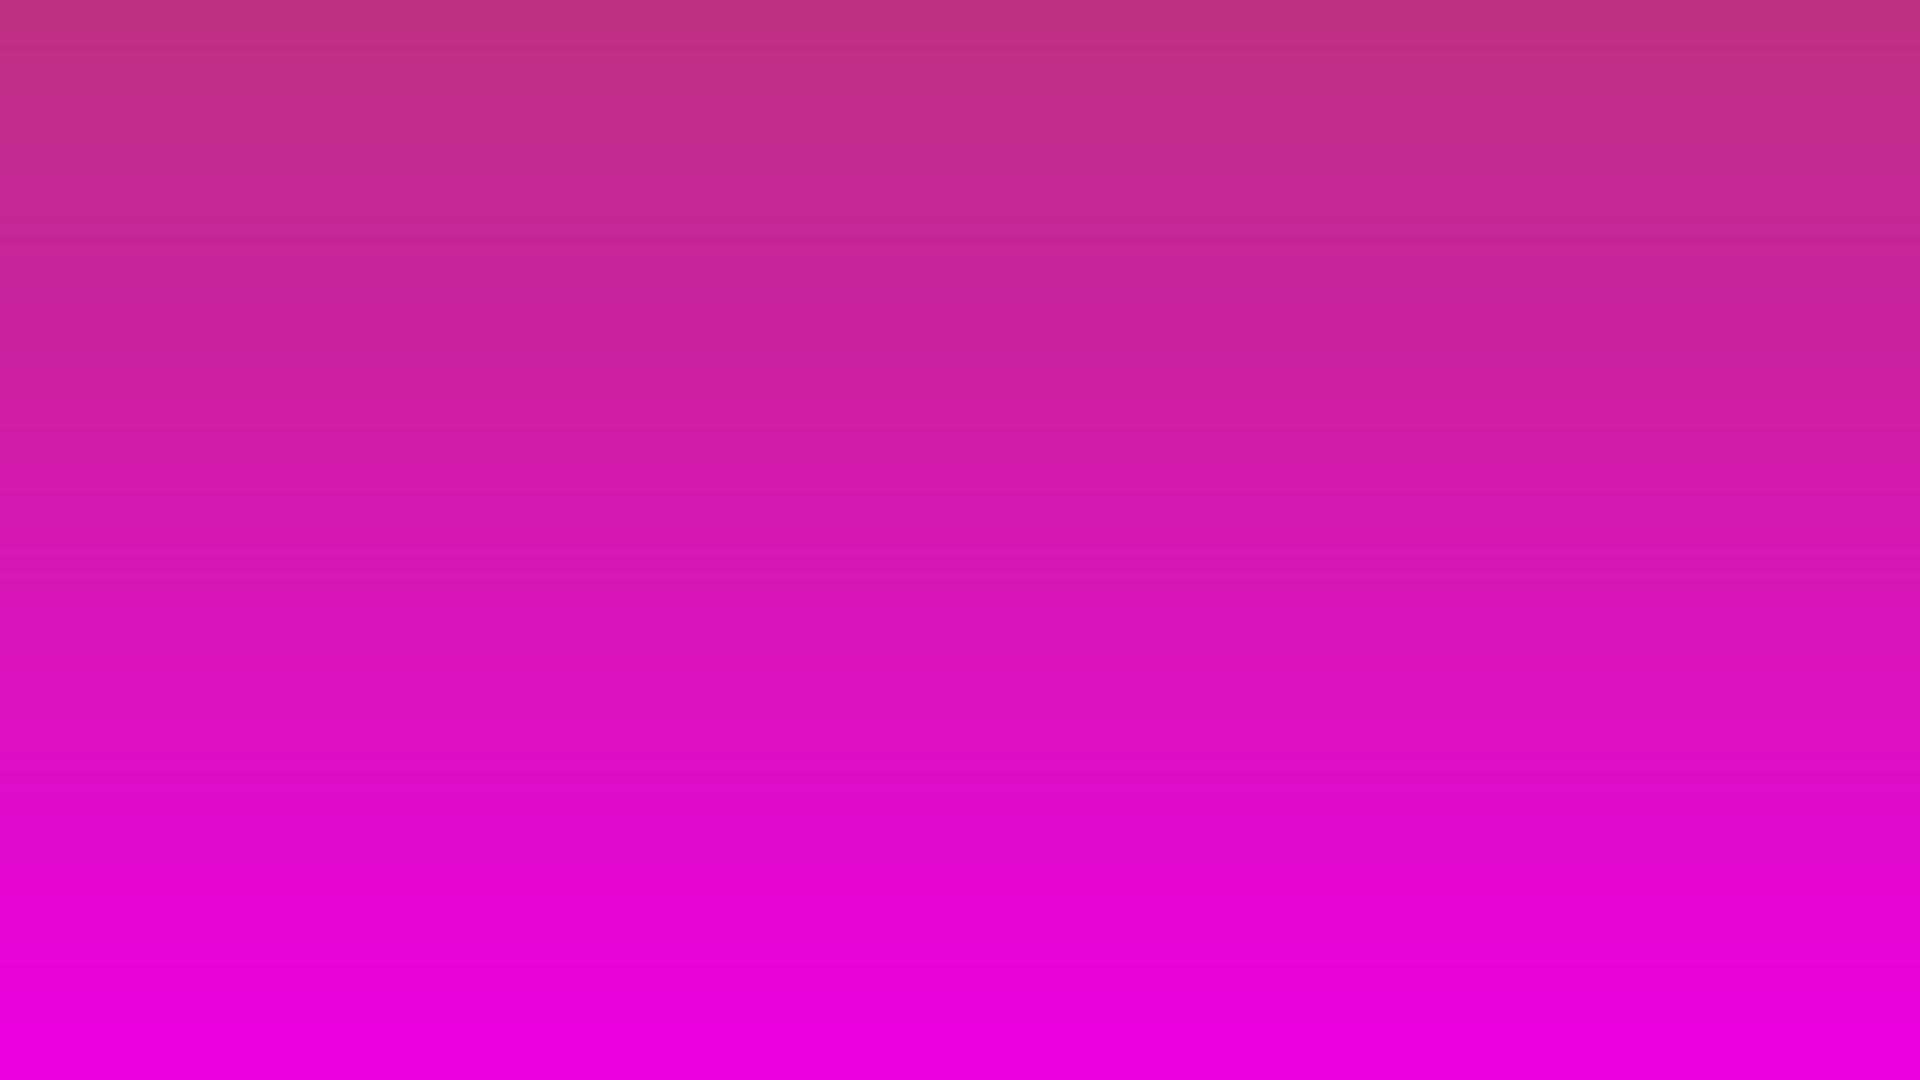 purp Gradient